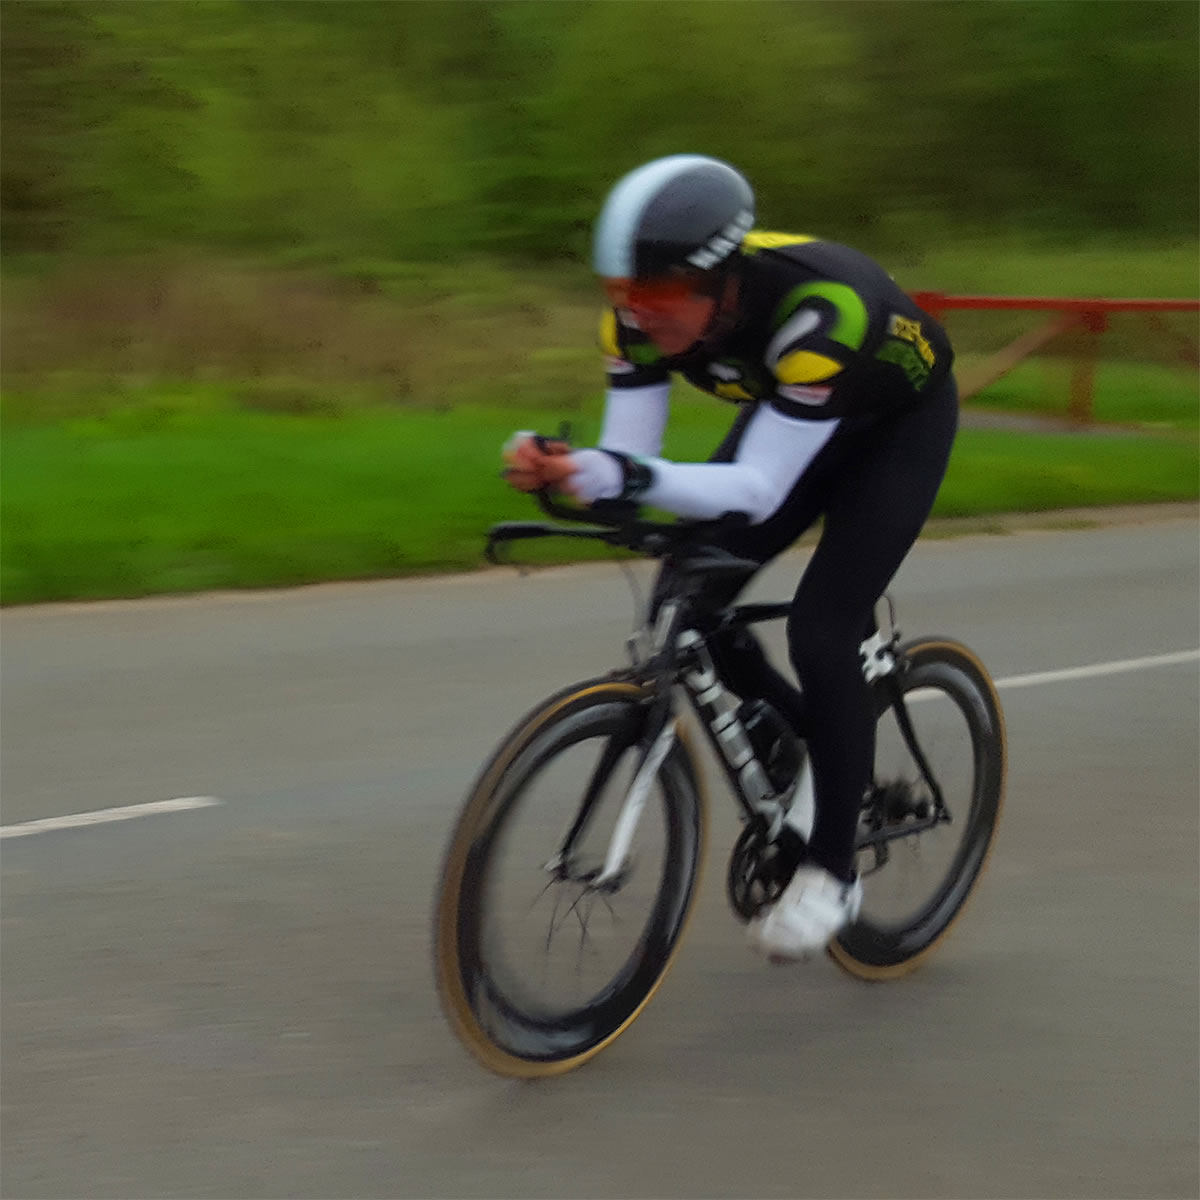 james mayers runcorn cycle club